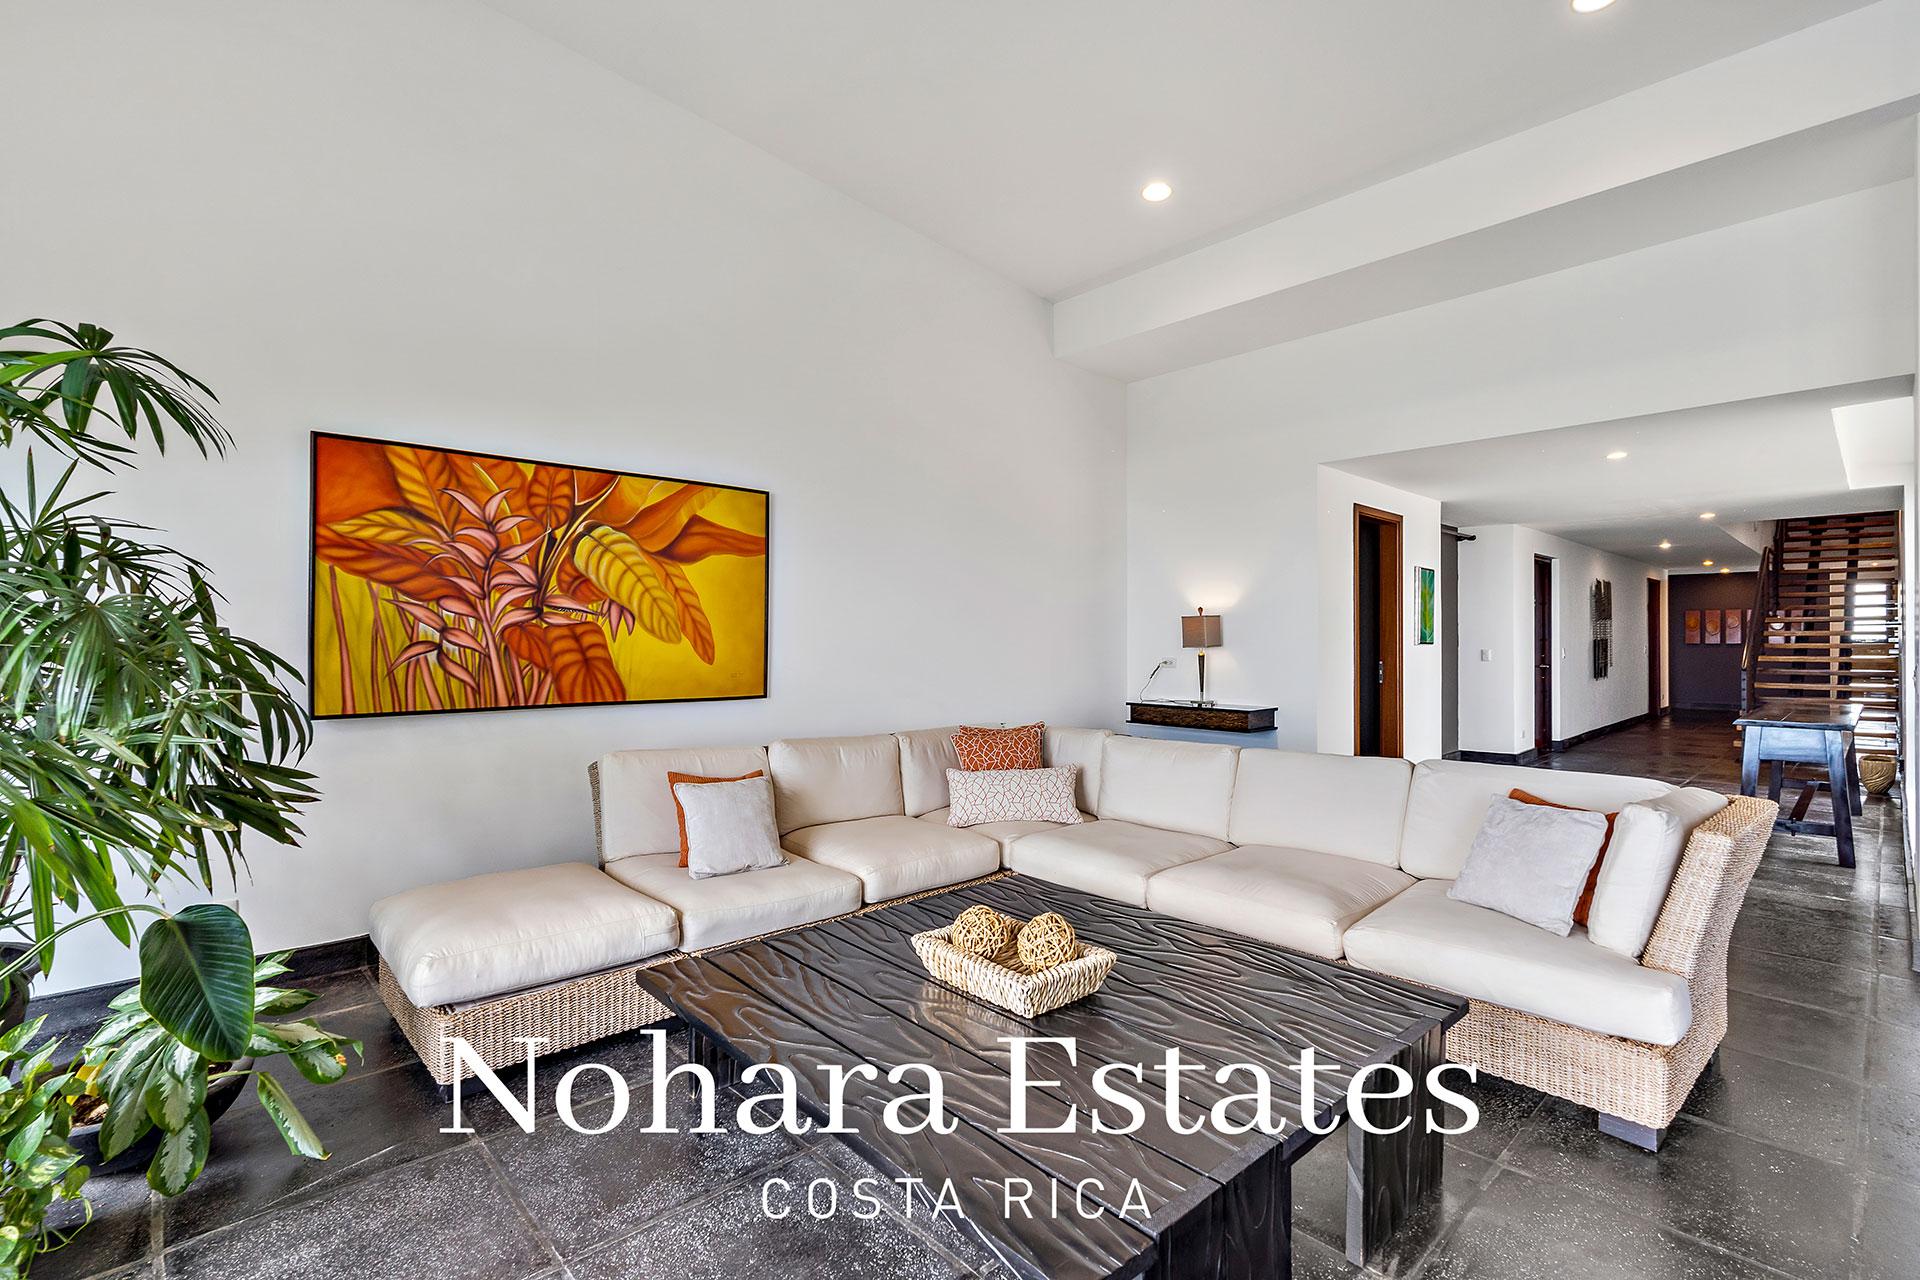 Nohara Estates Costa Rica 128 Penthouse Quepos Los Altos 21